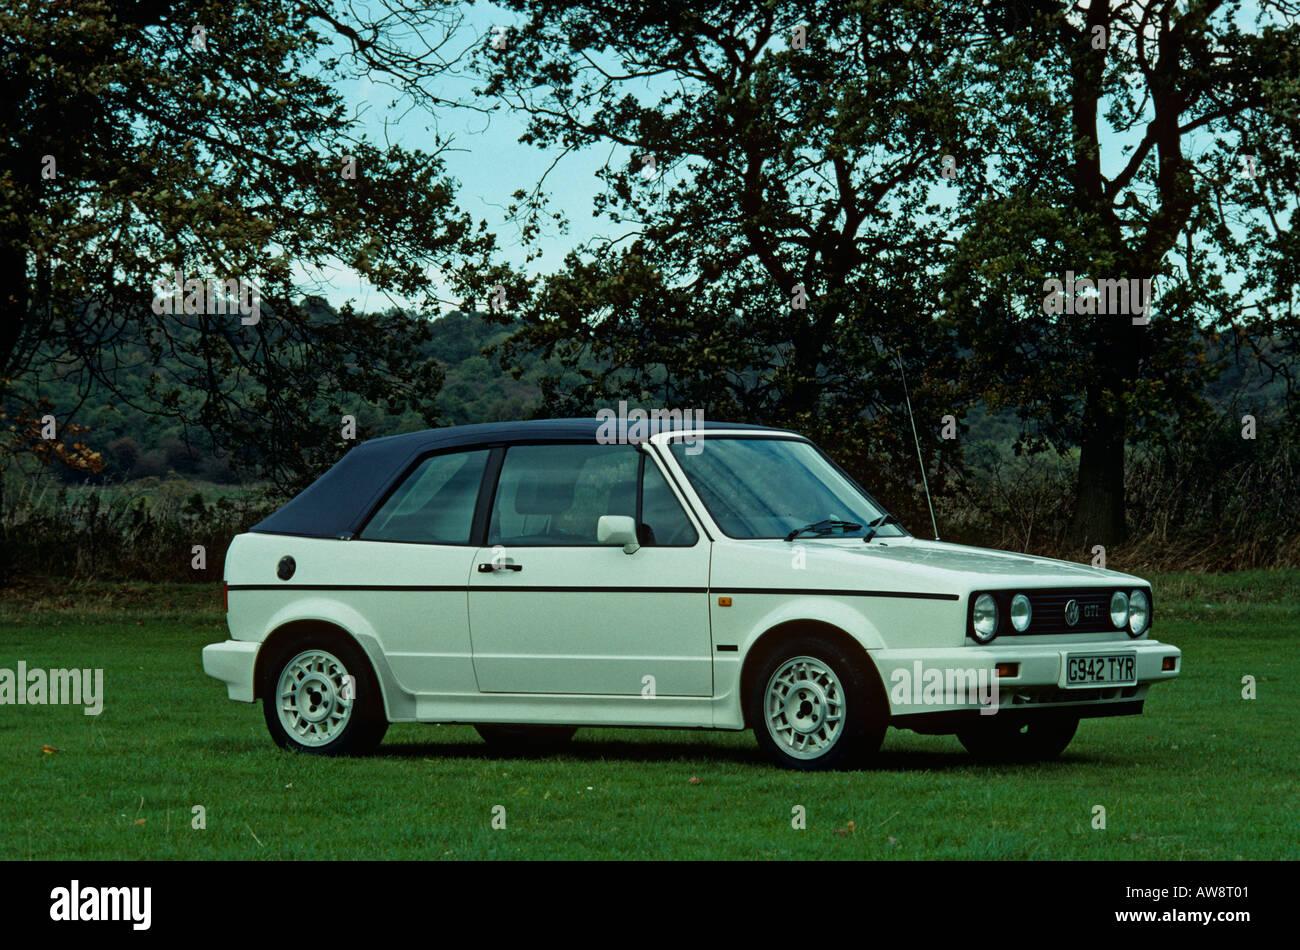 volkswagen golf mk1 gti cabriolet mk1 cabriolet 1980 to 1992 stock photo royalty free image. Black Bedroom Furniture Sets. Home Design Ideas